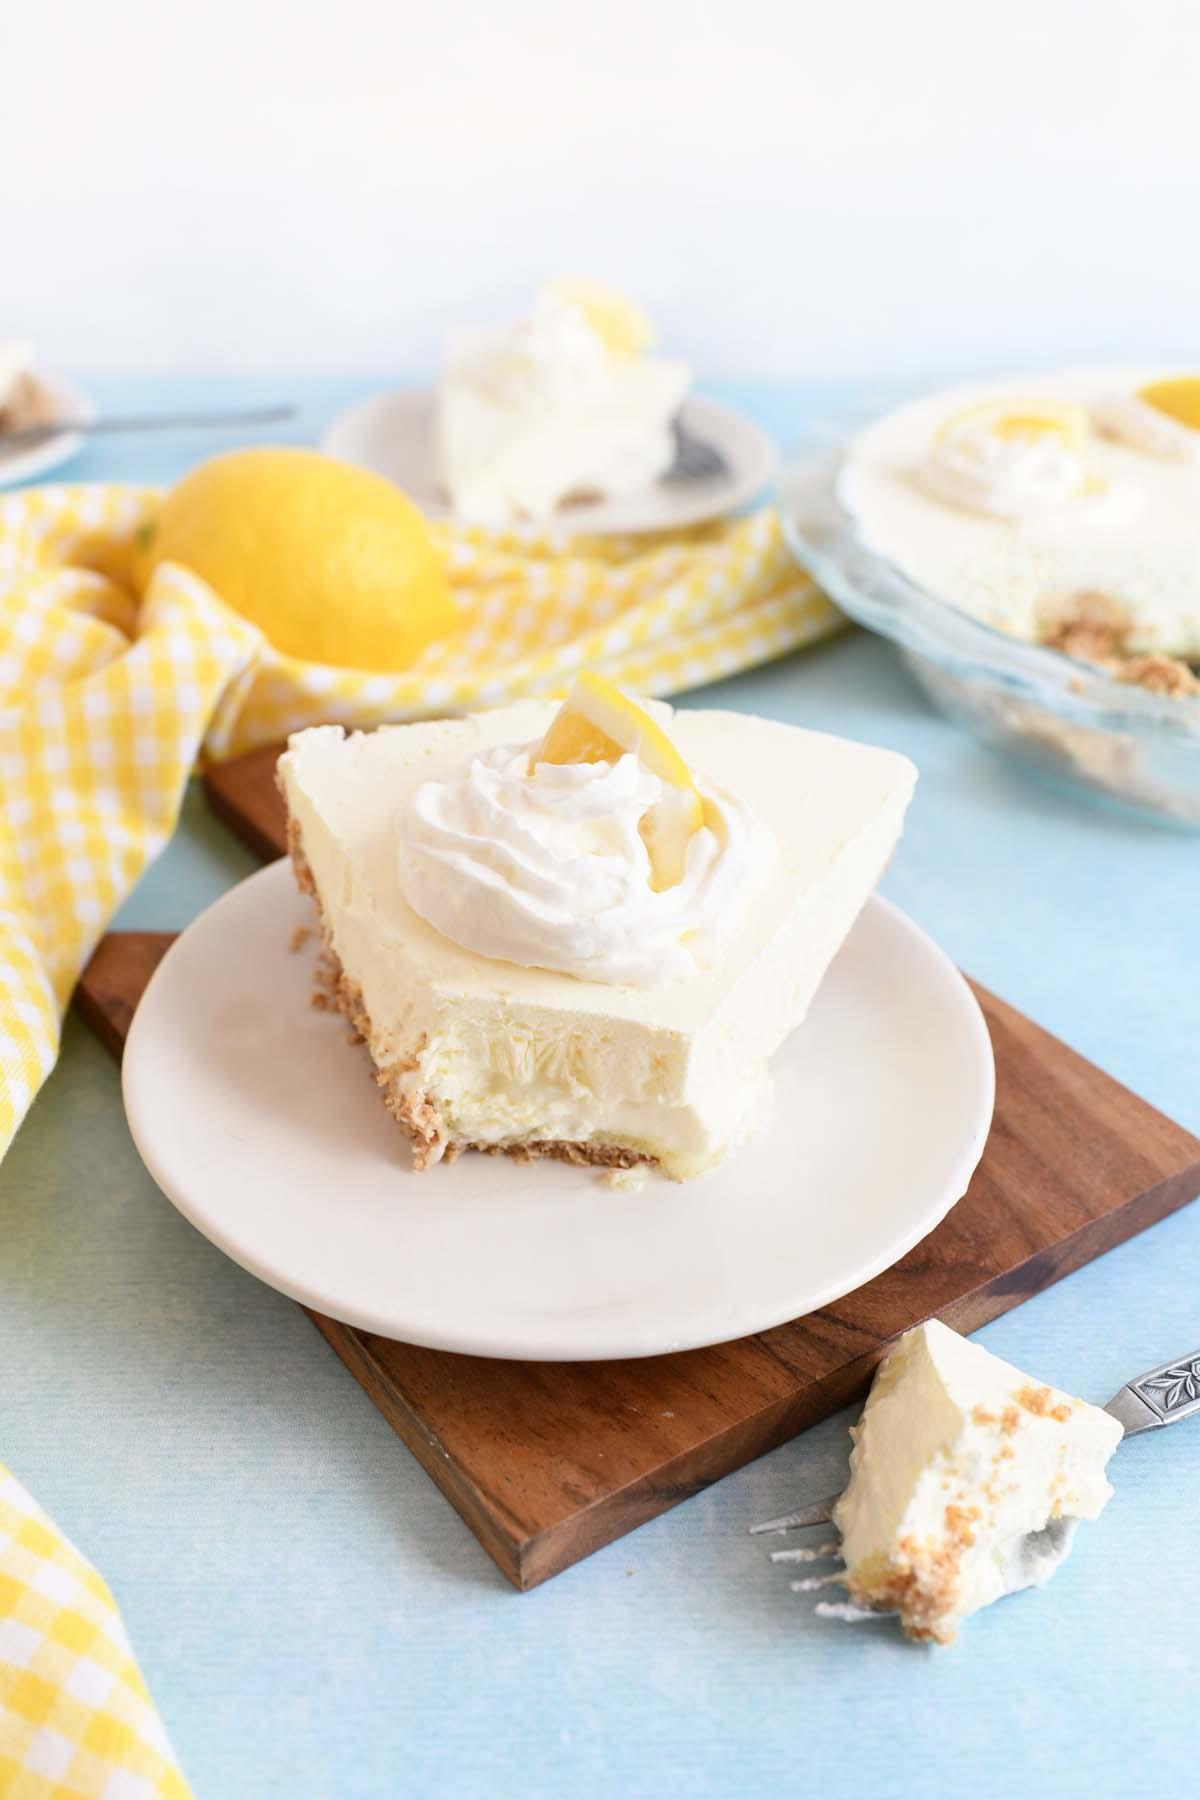 Lemonade No-Bake pie with a bite taken out.